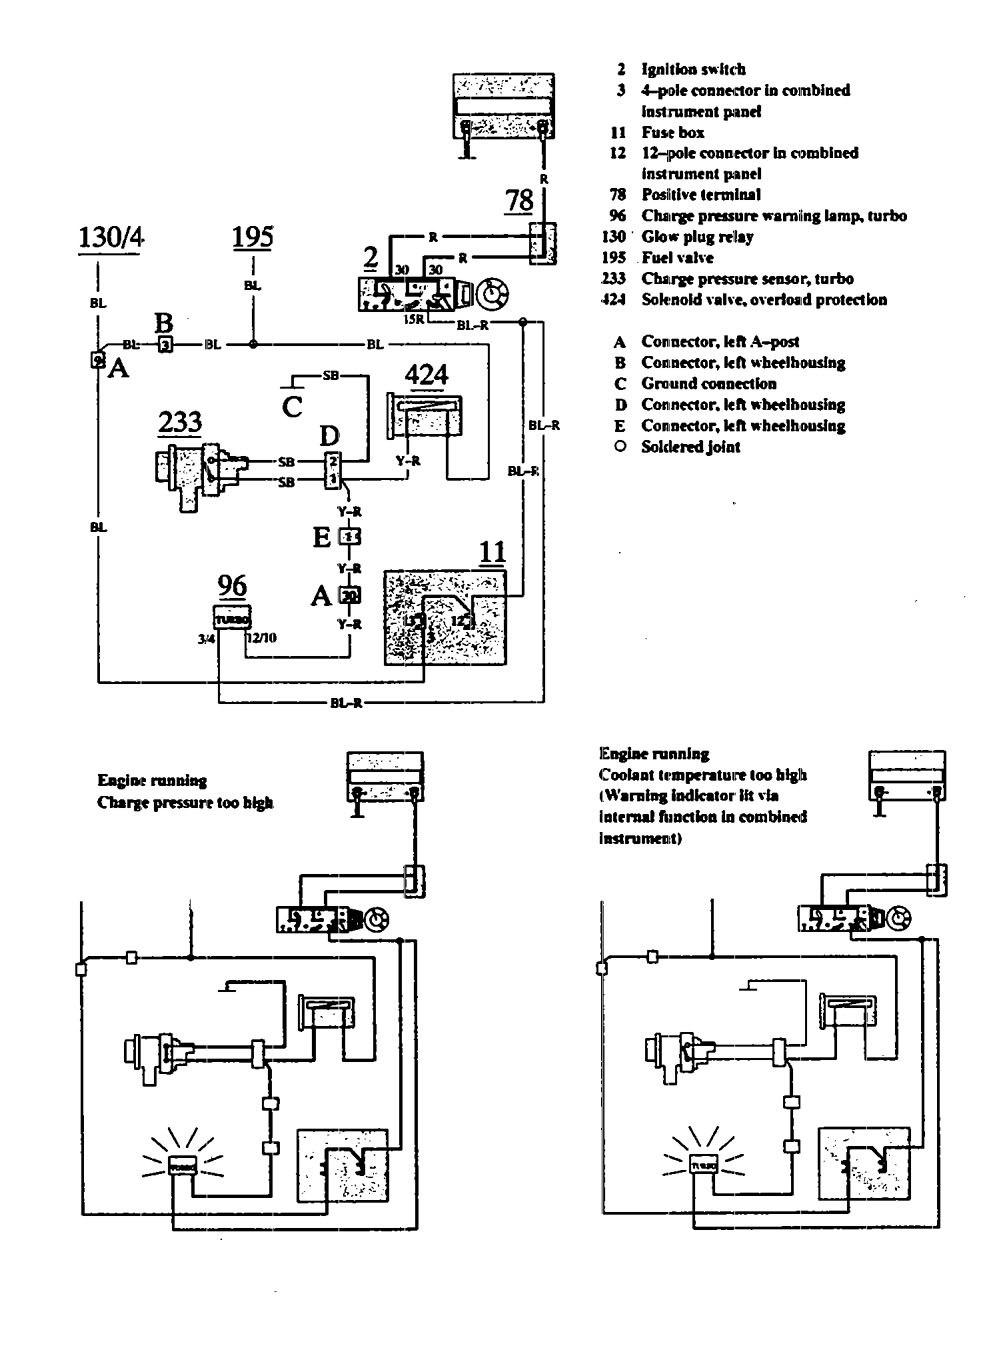 volvo 740 wiring diagram 1991 - auto electrical wiring diagram on volvo  940 radio,